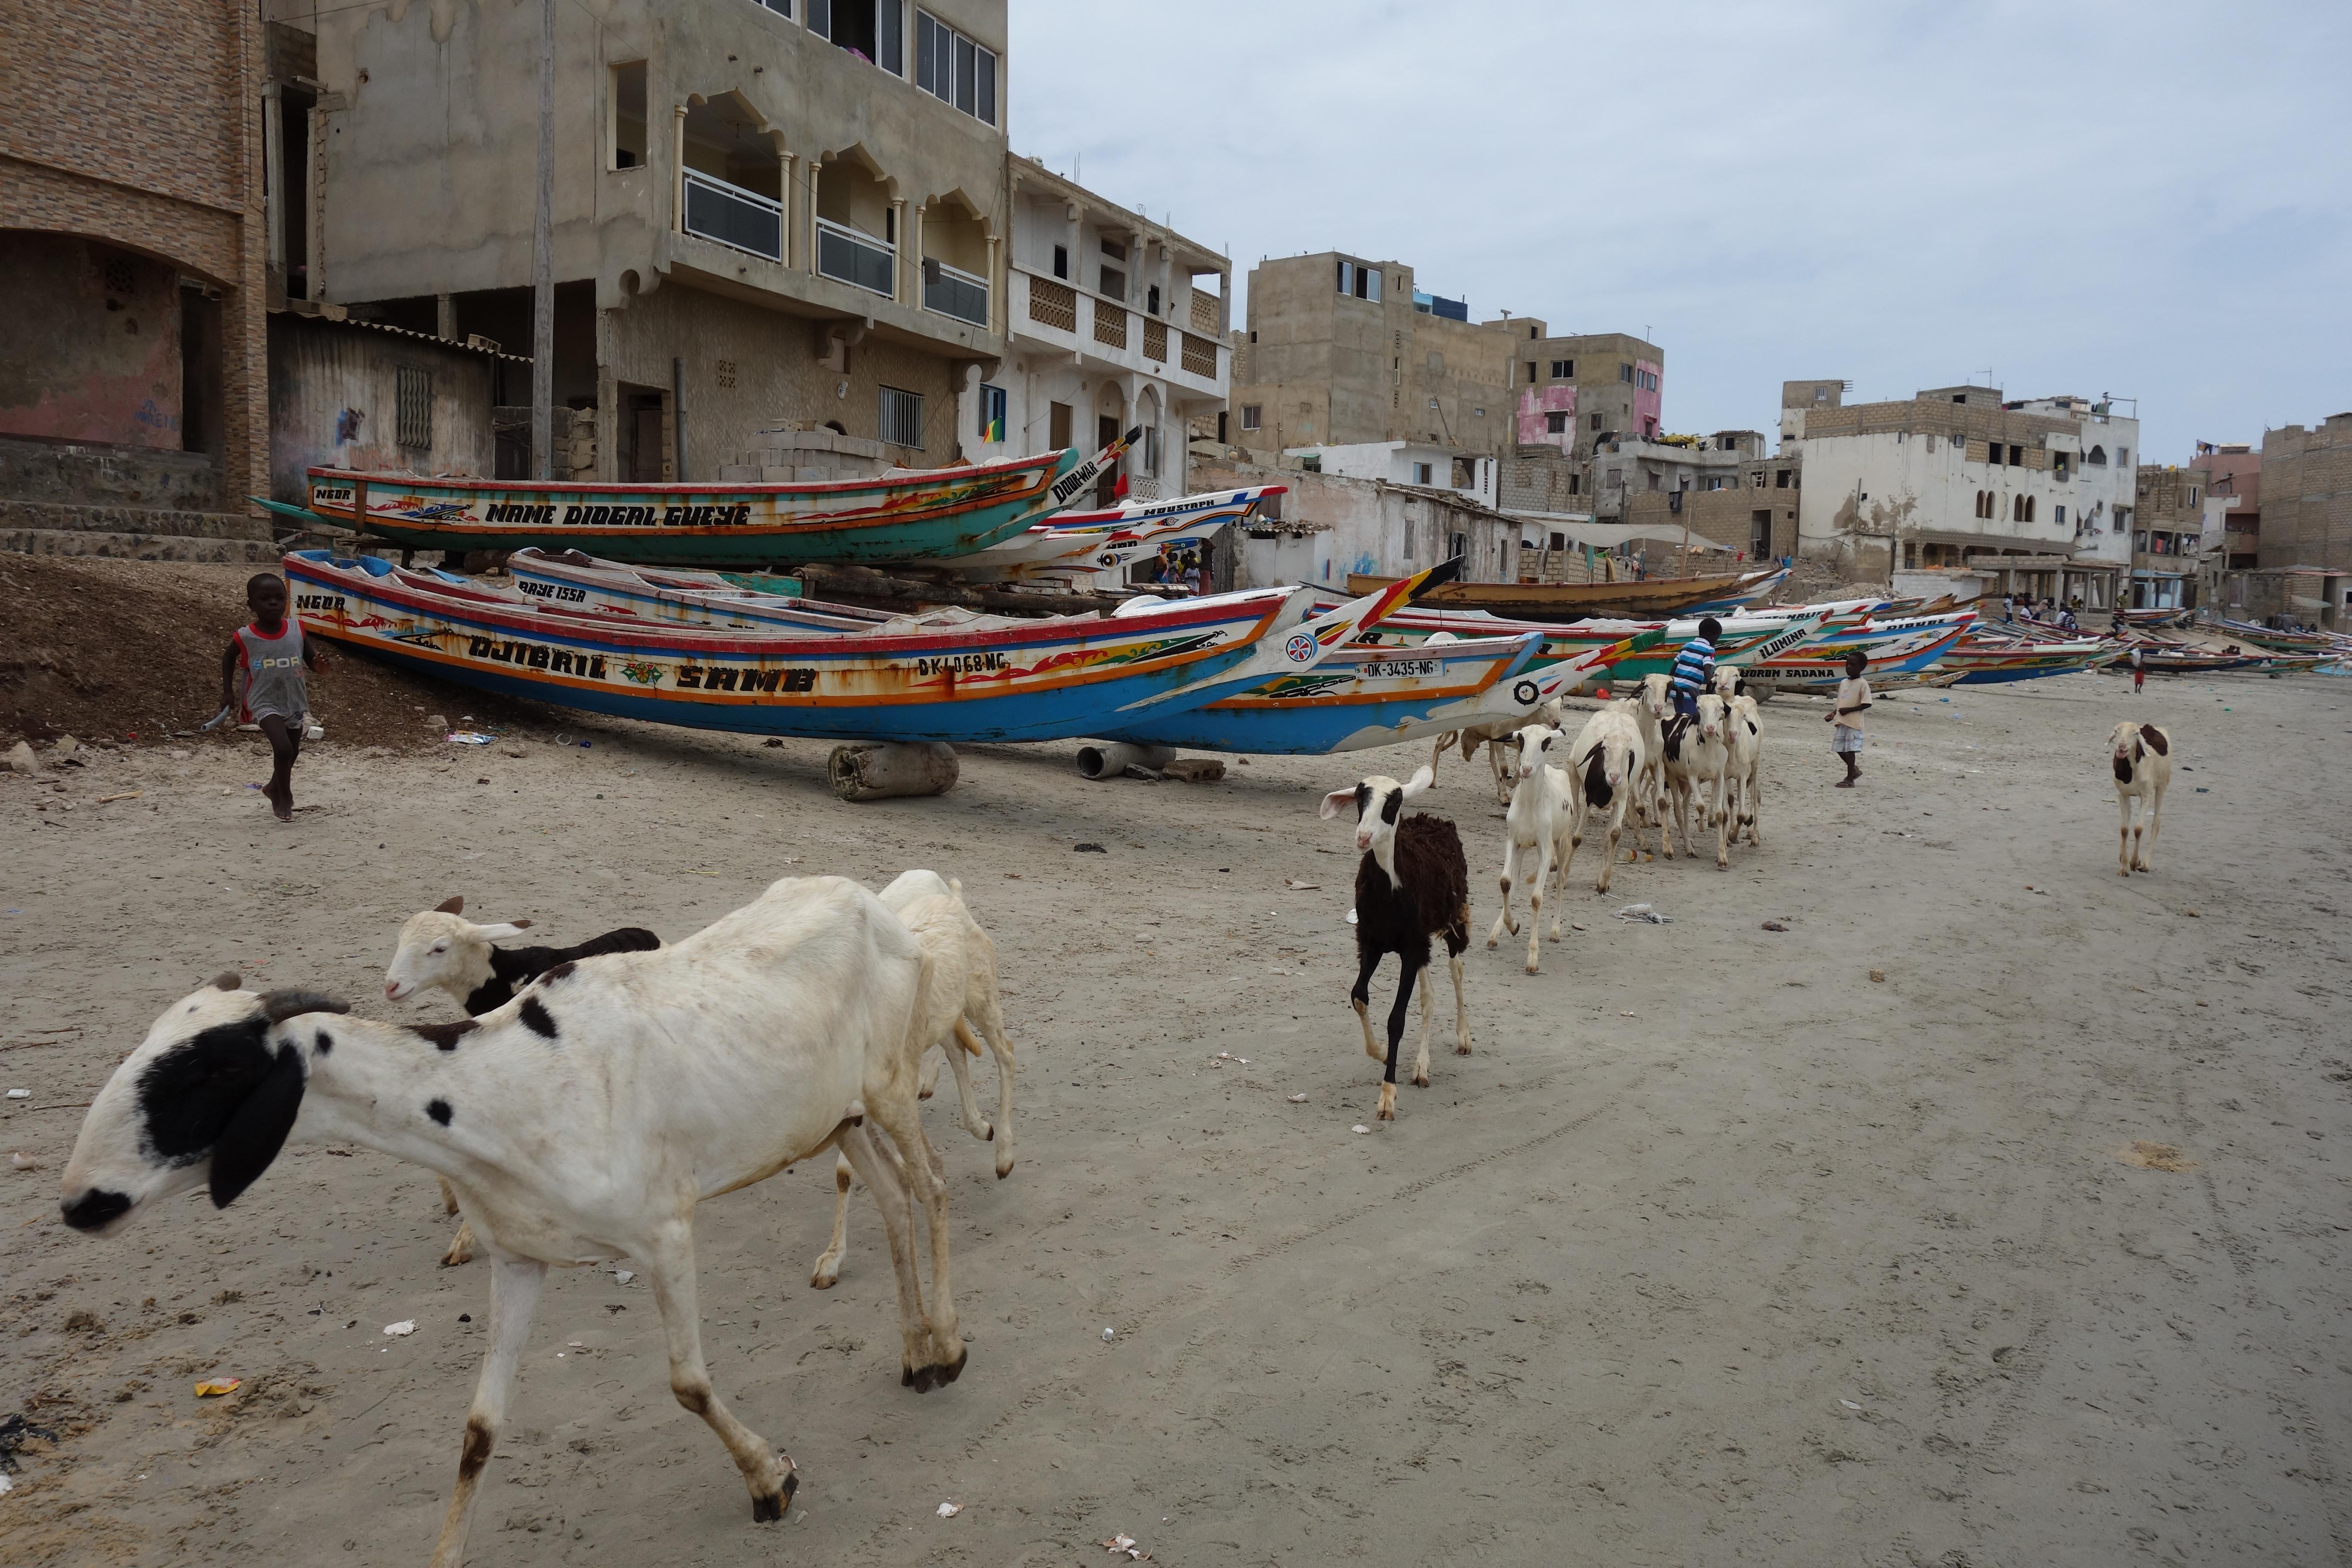 plage de n'gor ngor beach goats (1)